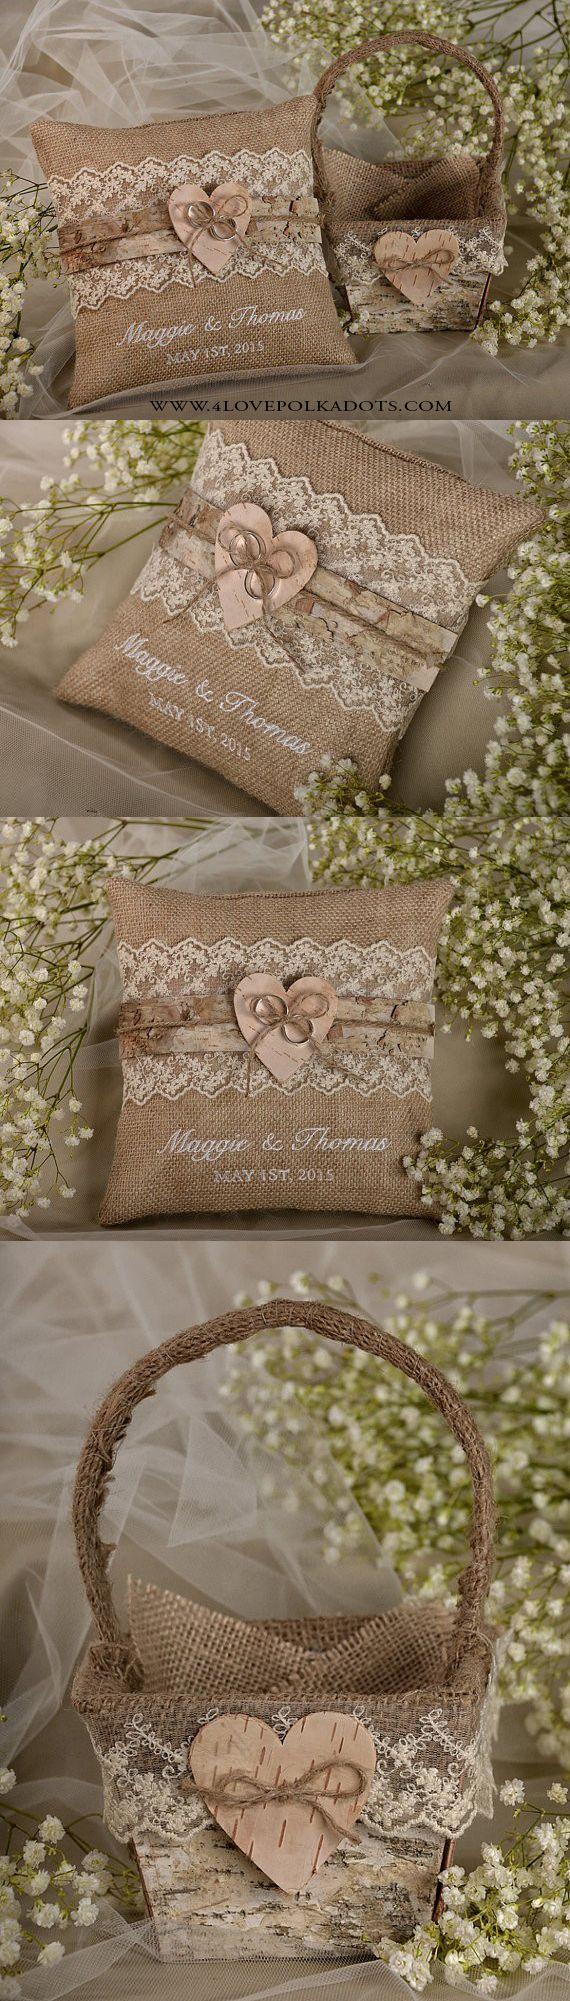 Rustic Wedding Flower Girl Set : Burlap Ring Pillow & Matching Basket #weddingideas #rustic #flowergirl